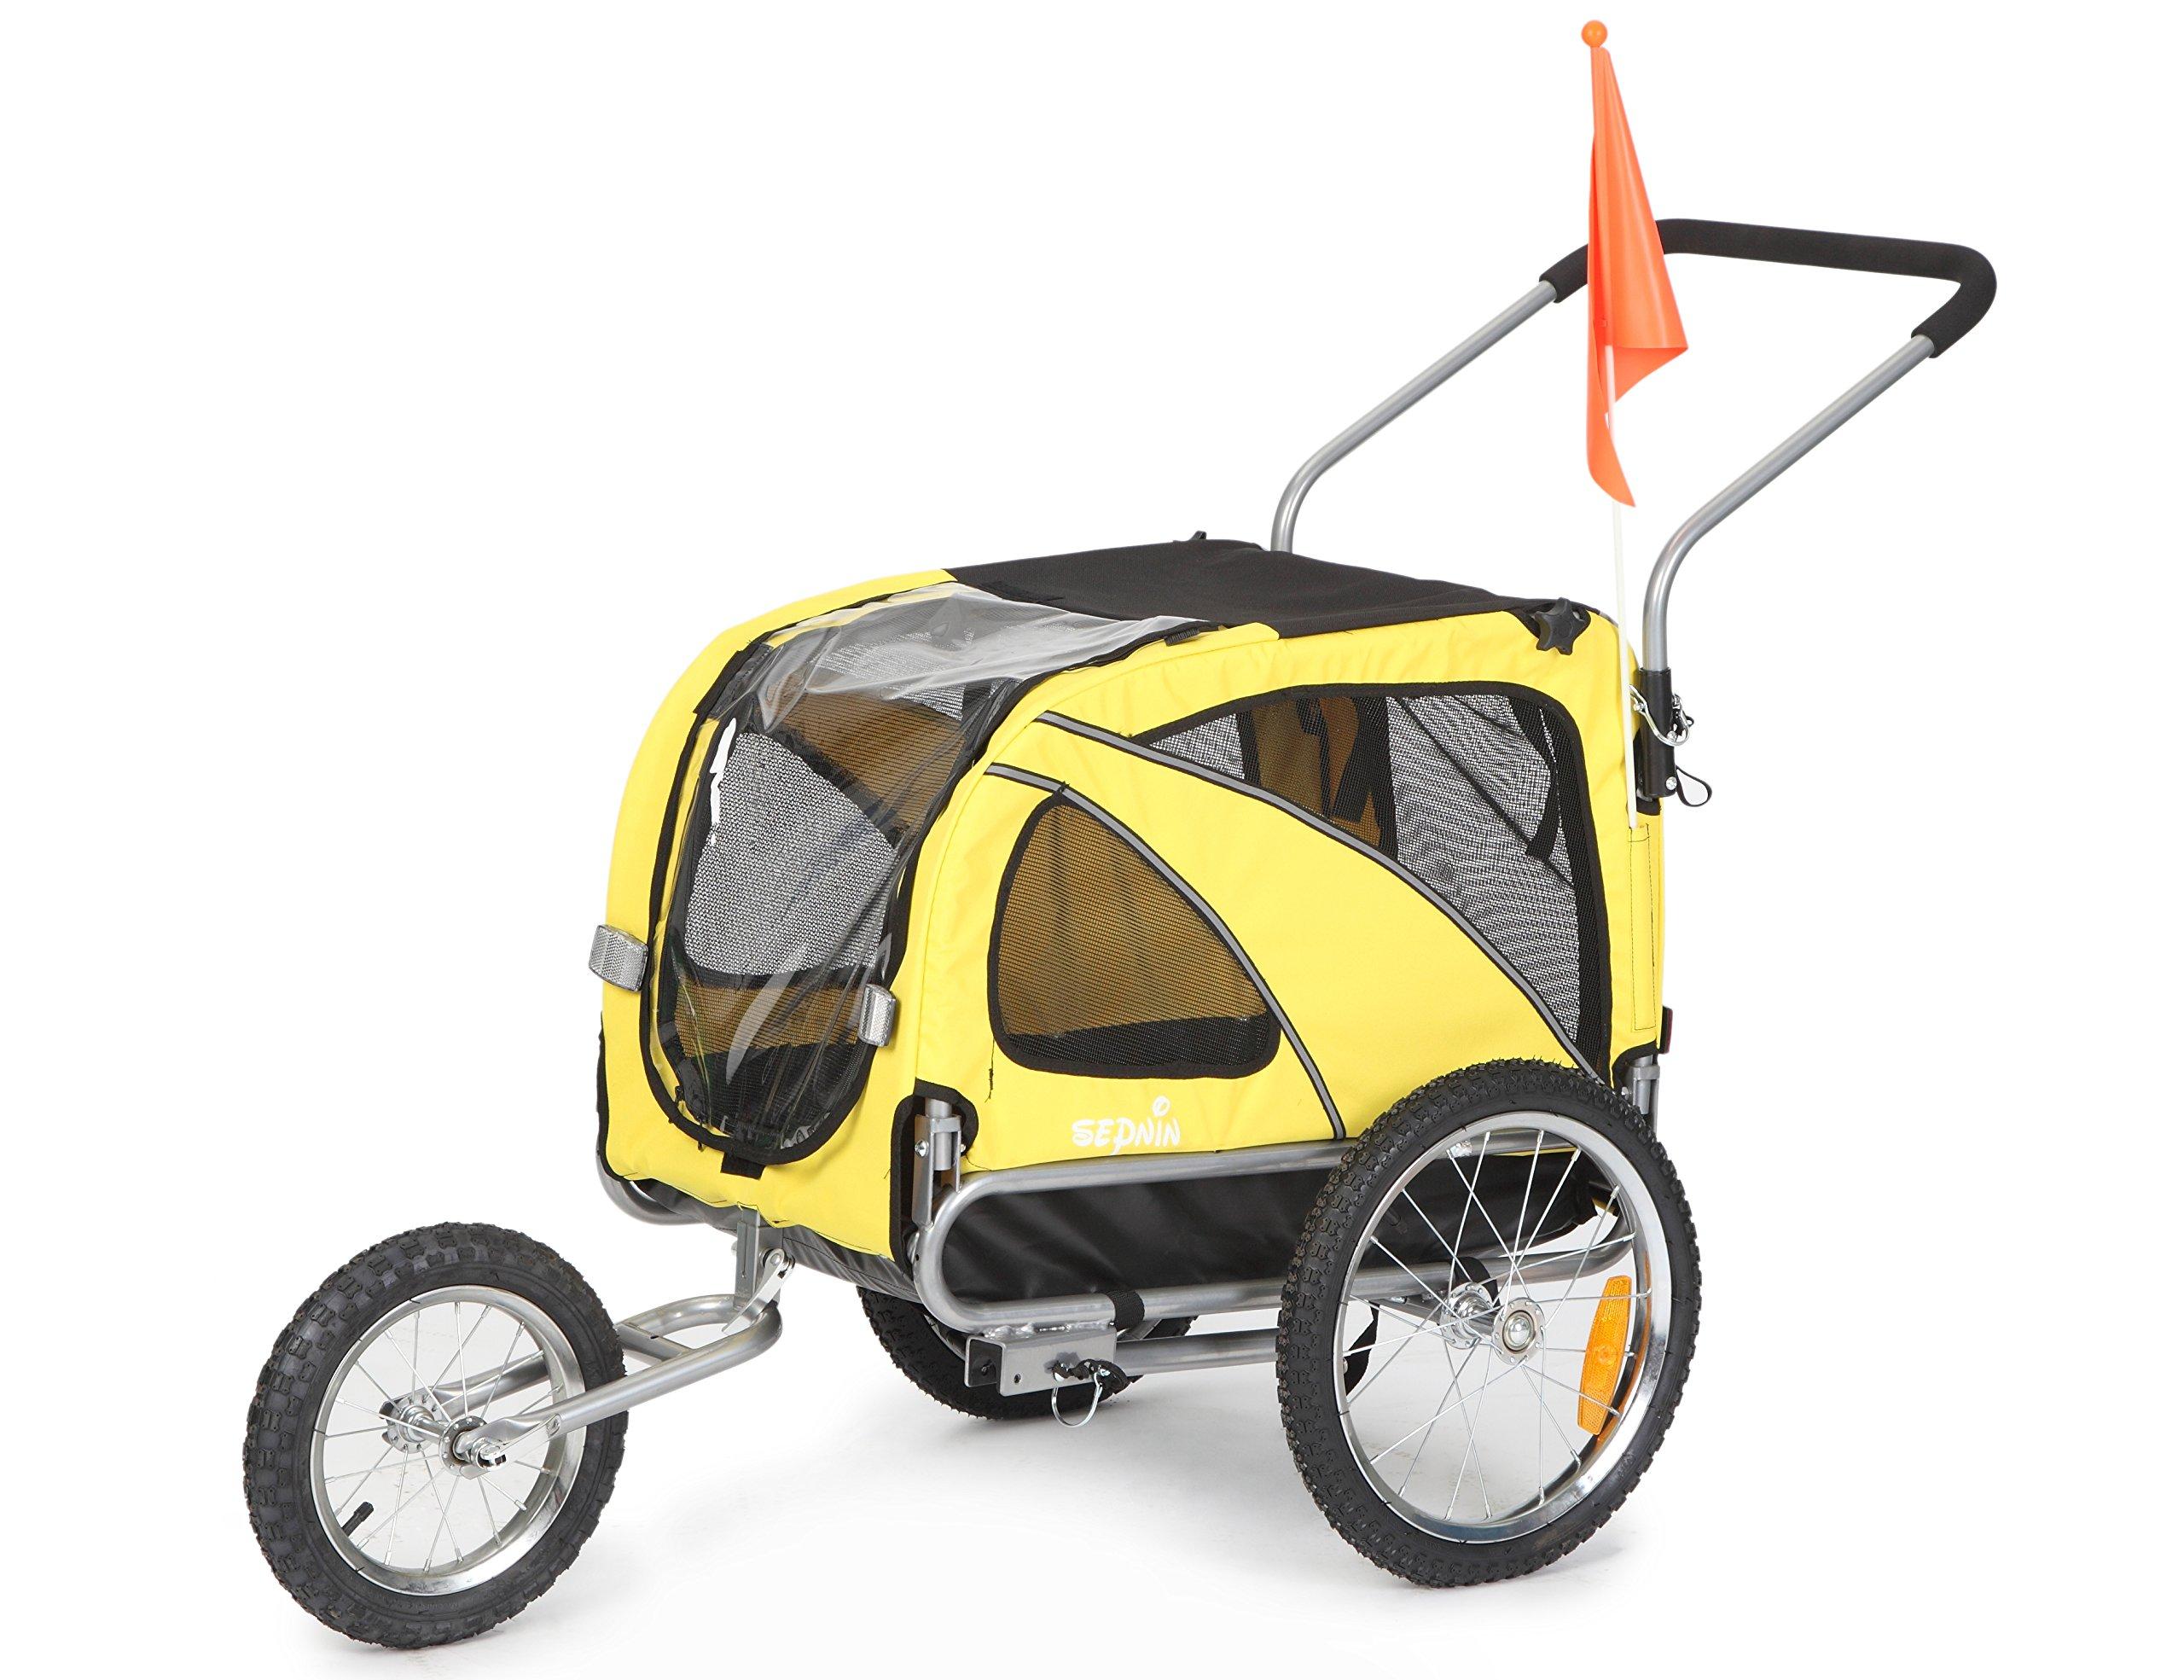 Sepnine 2 in1 medium pet dog bike trailer bicycle trailer and stroller jogger 10201 (Yellow)